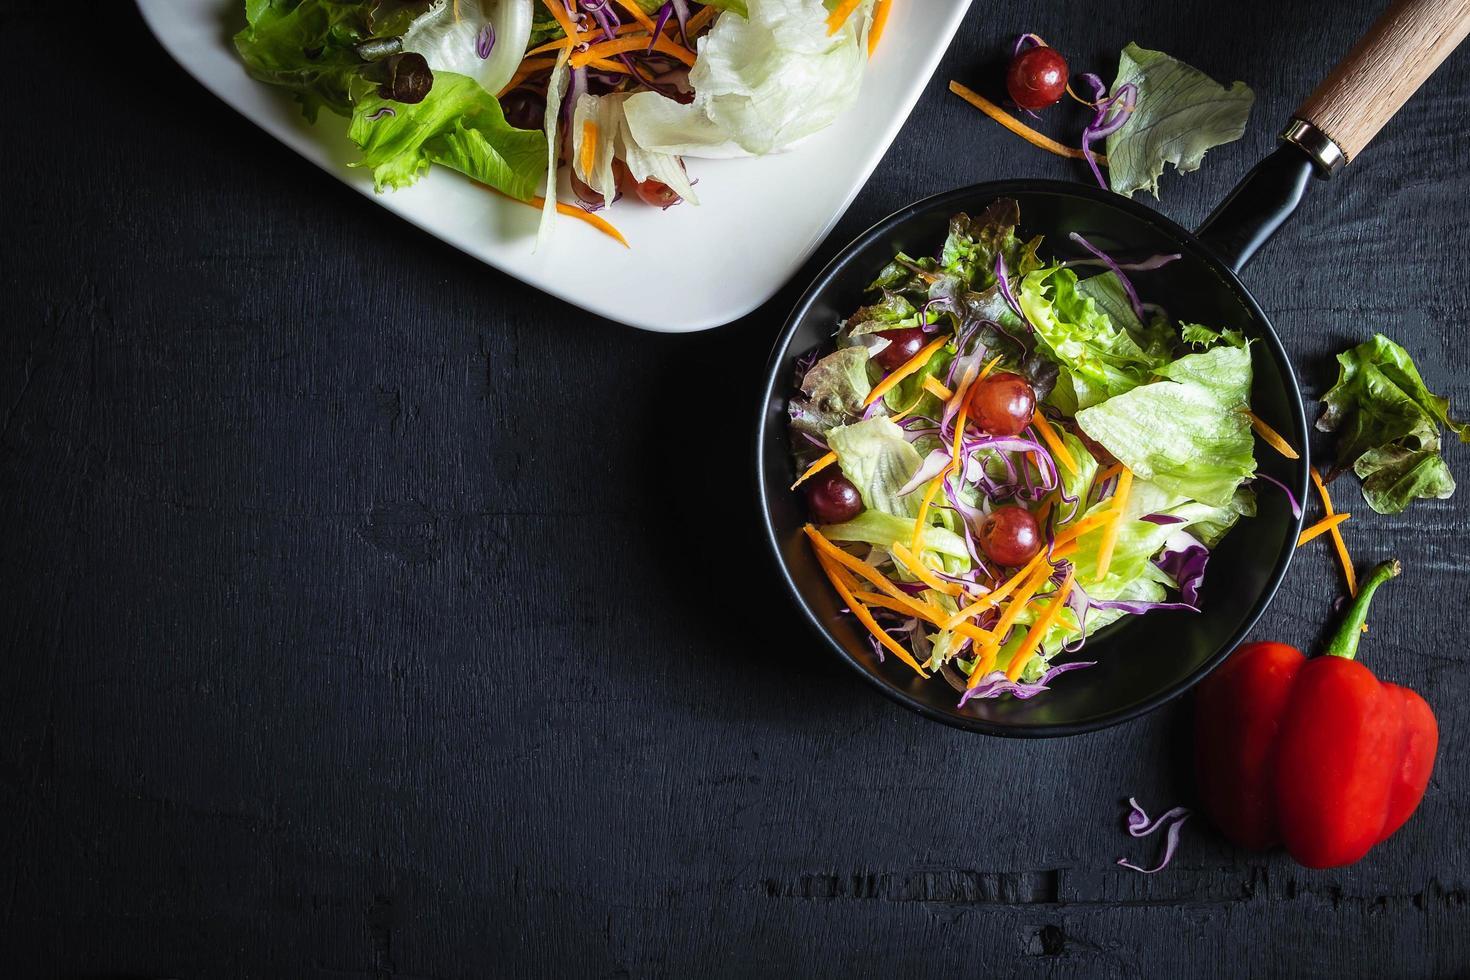 ensalada de verduras en sartén foto